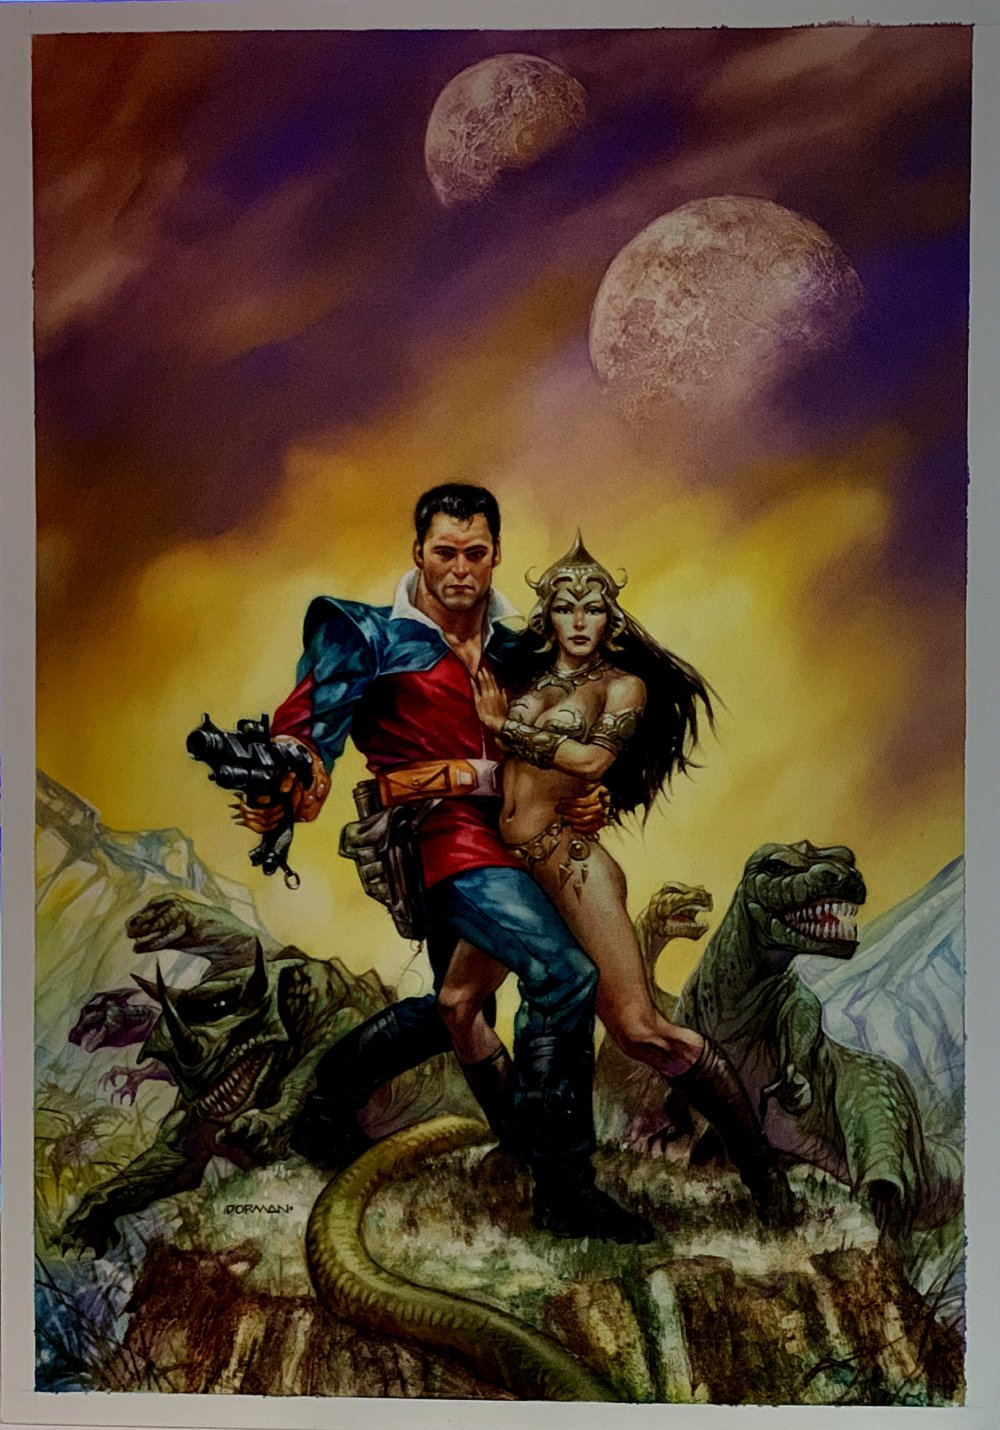 Turbo Jones: Pathfinder #1 Cover Painting (Large Art) 1991